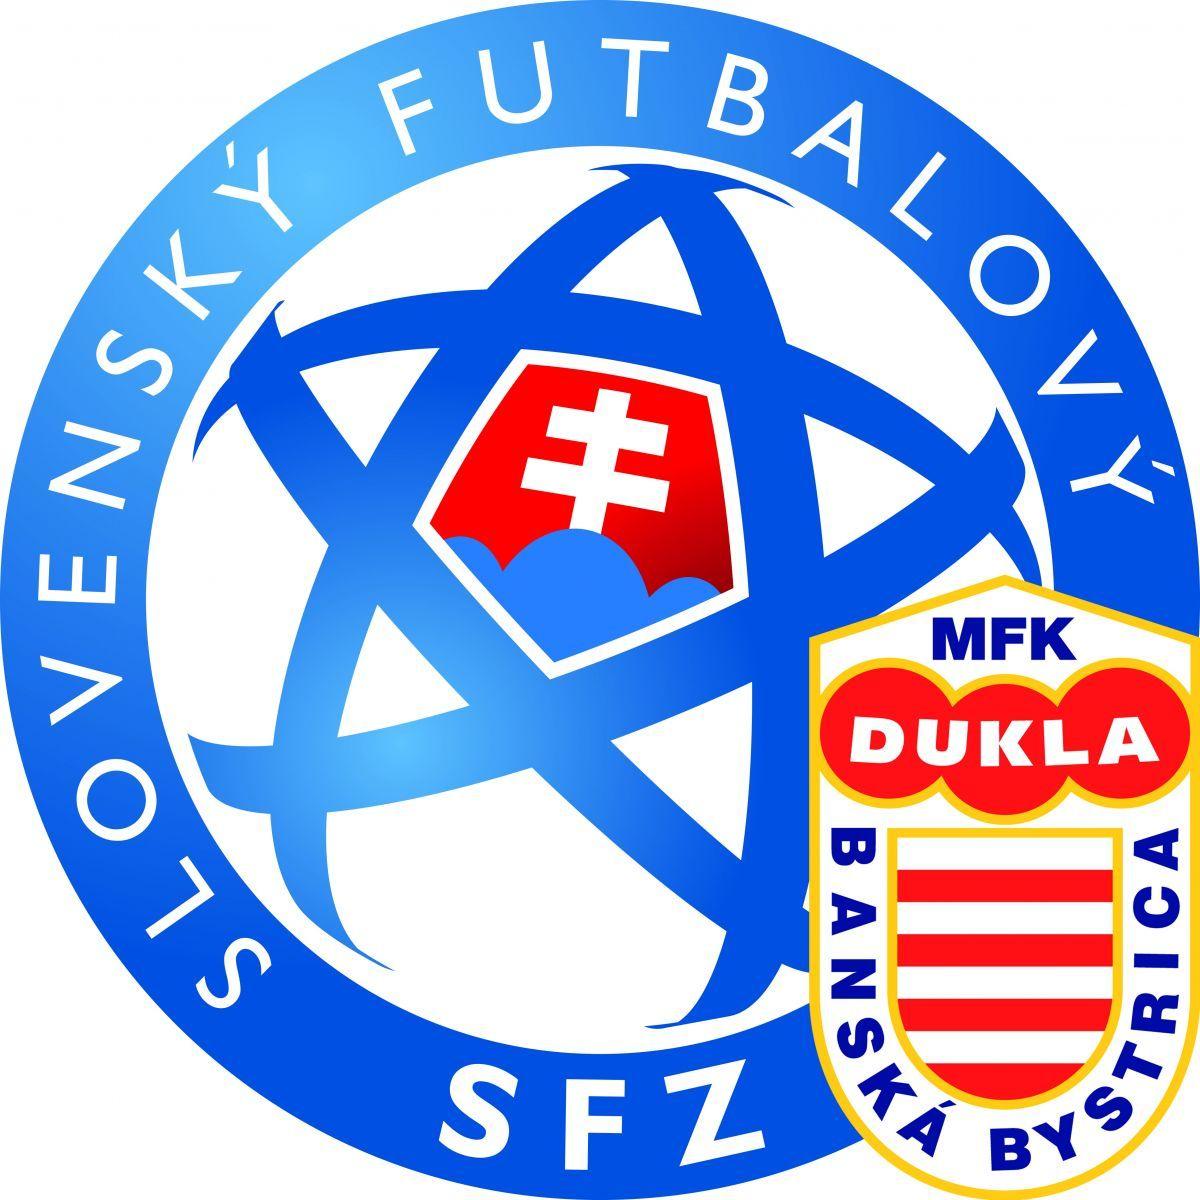 Stanovisko vedenia MFK Dukla Banská Bystrica k rozhodnutiu ÚLK